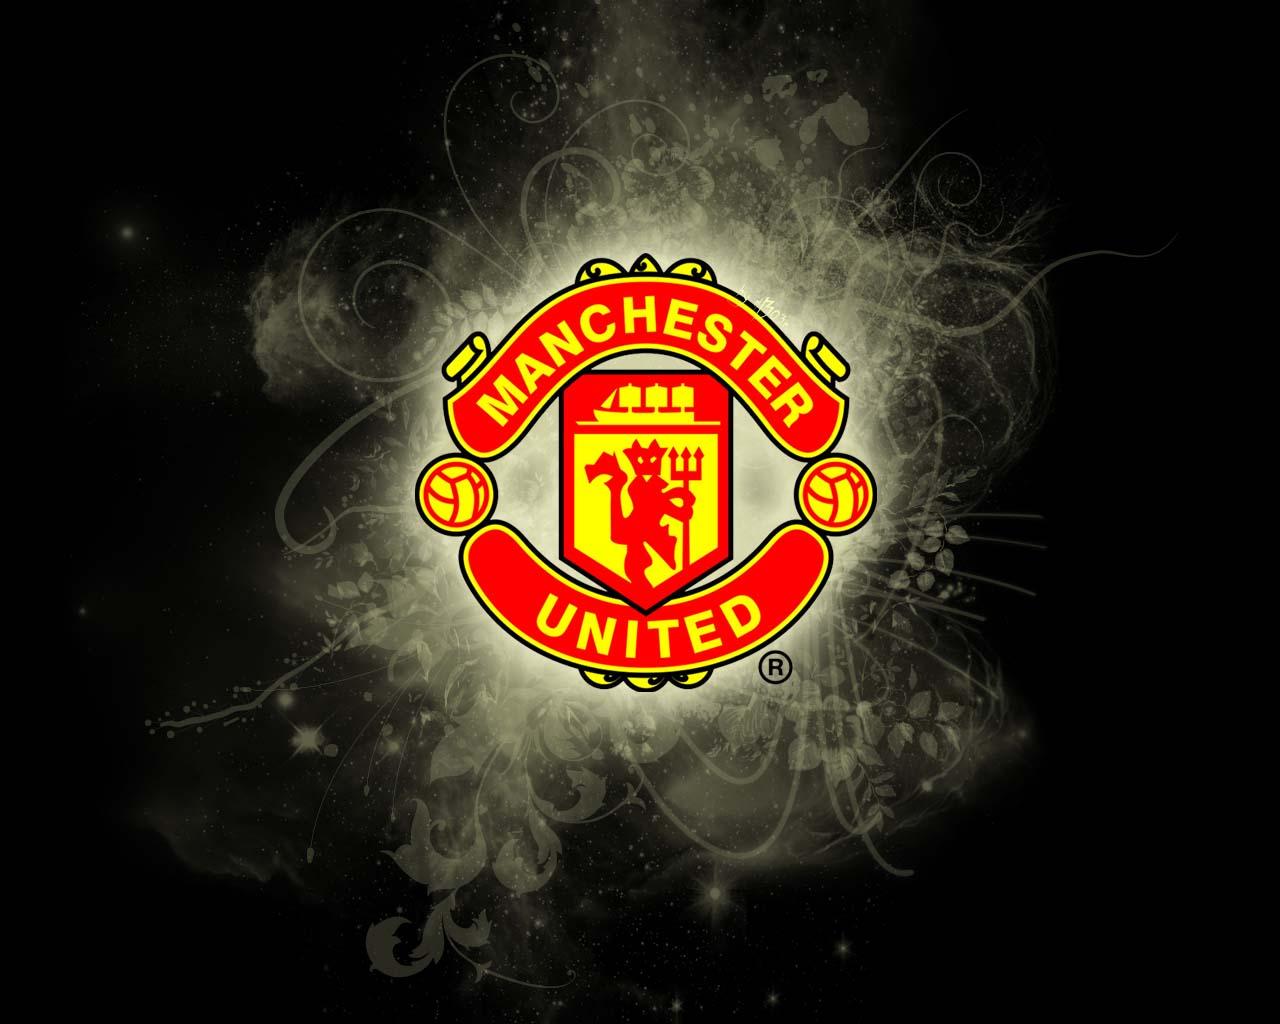 Wallpapers Logo Manchester United Terbaru 2017 1440x810 9769 KB 1280x1024